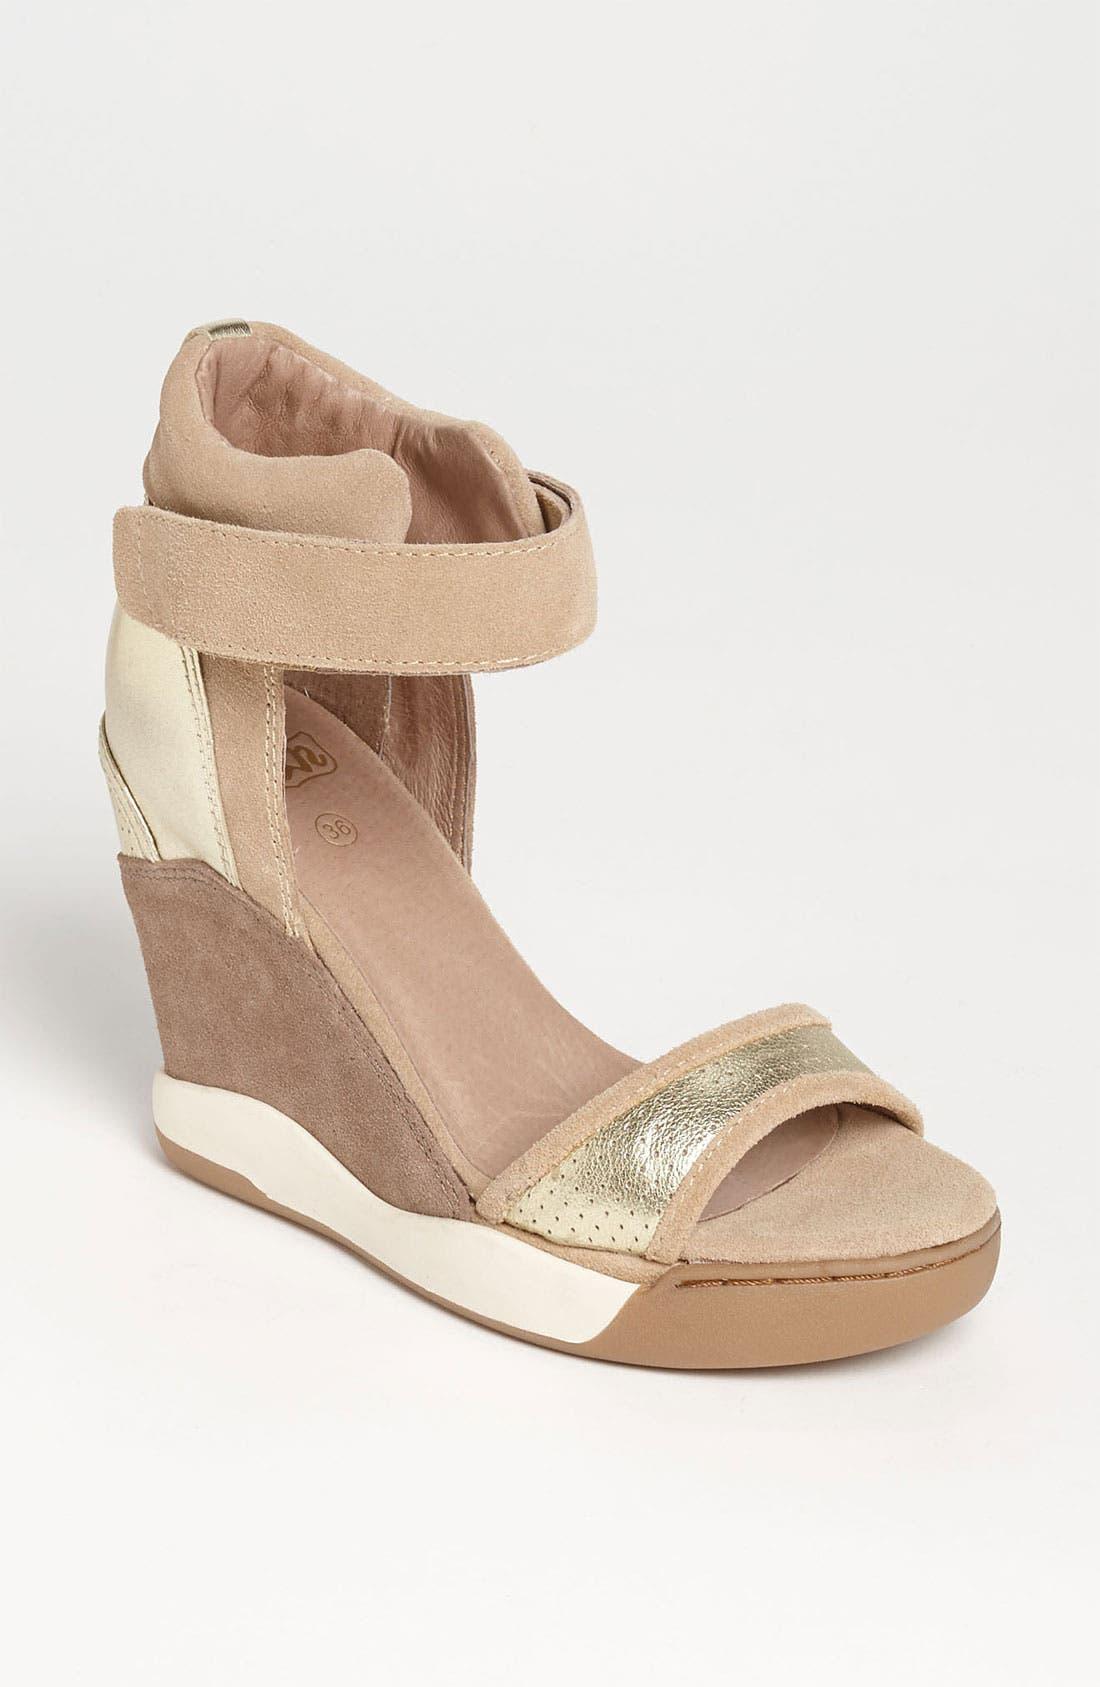 Main Image - Ash 'Eloise Bis' Sandal